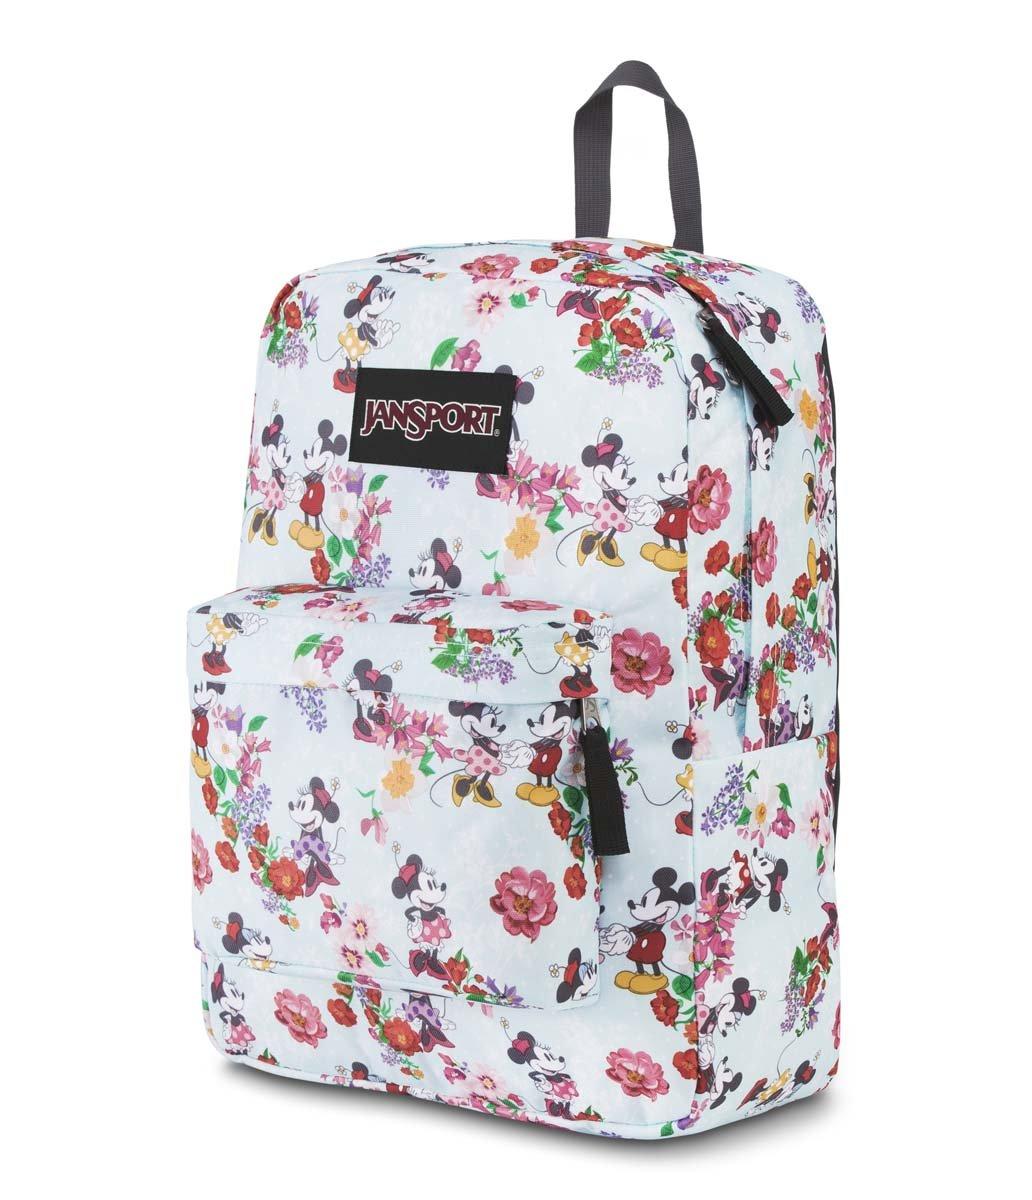 Jansport Disney Lil Break Pouch Blooming Minnie Update Daftar Tempat Aksesoris Right White Bow Dot Superbreak Backpack Js0a3bb33d4 900 Shops Clothing